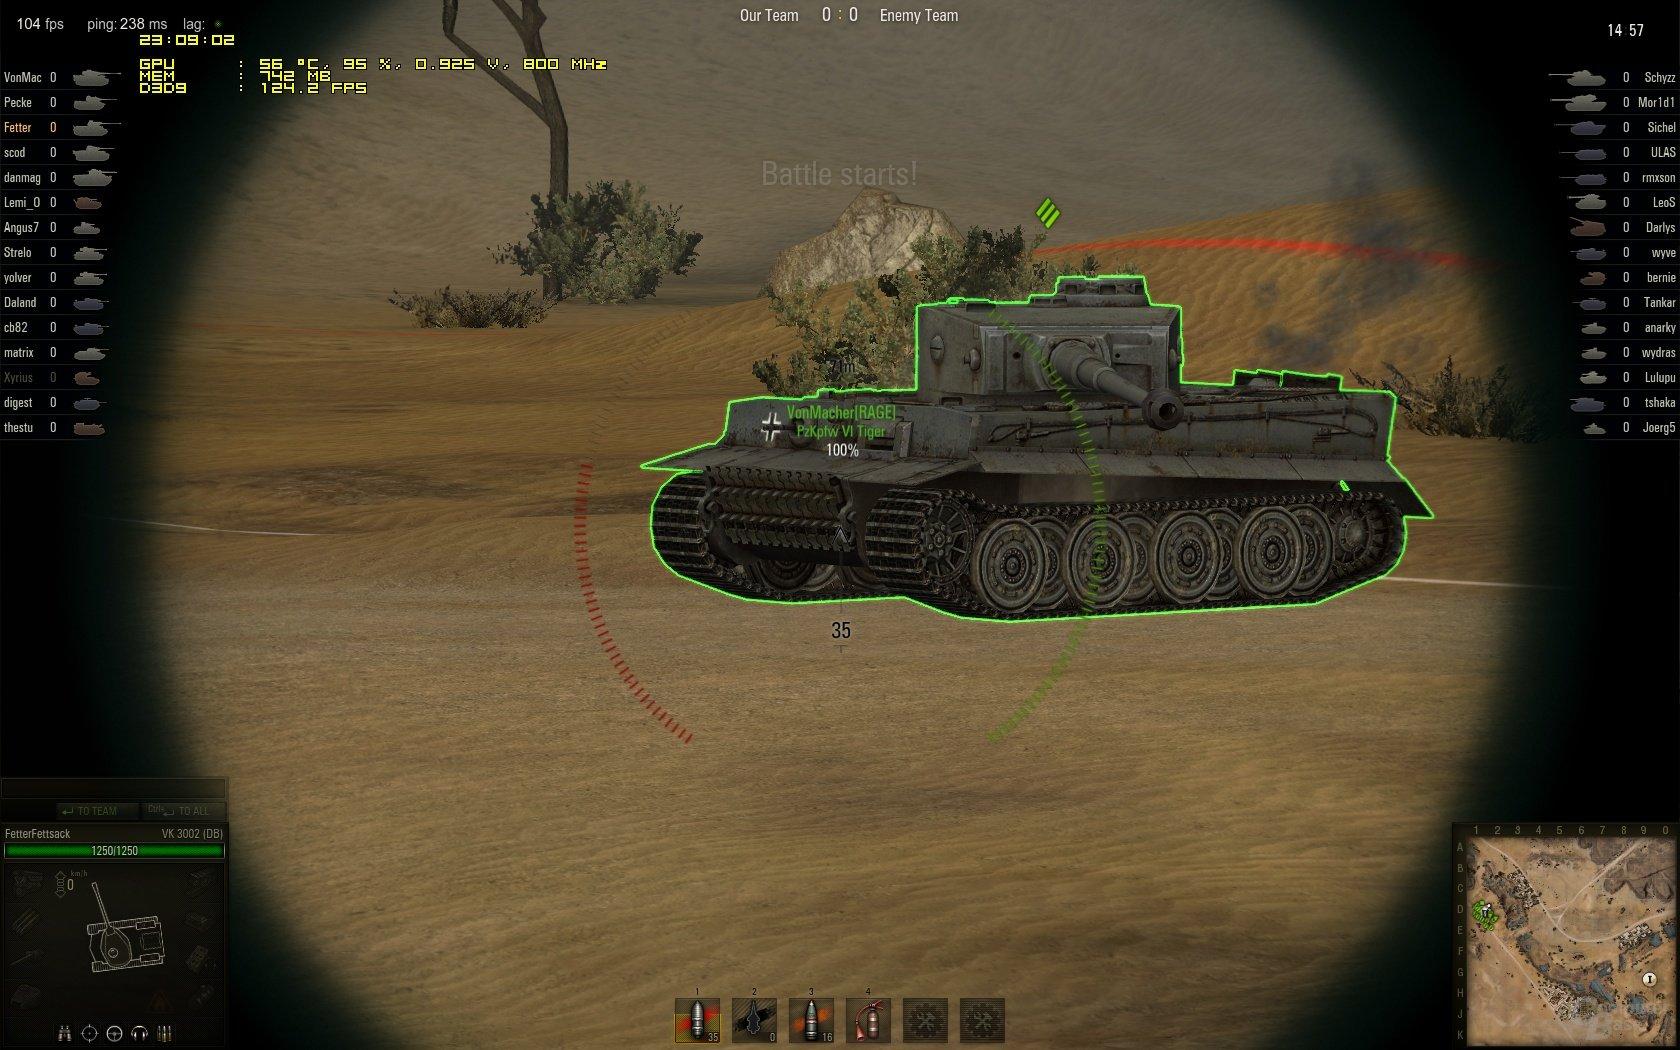 Welt der Panzer bevorzugt Matchmaking